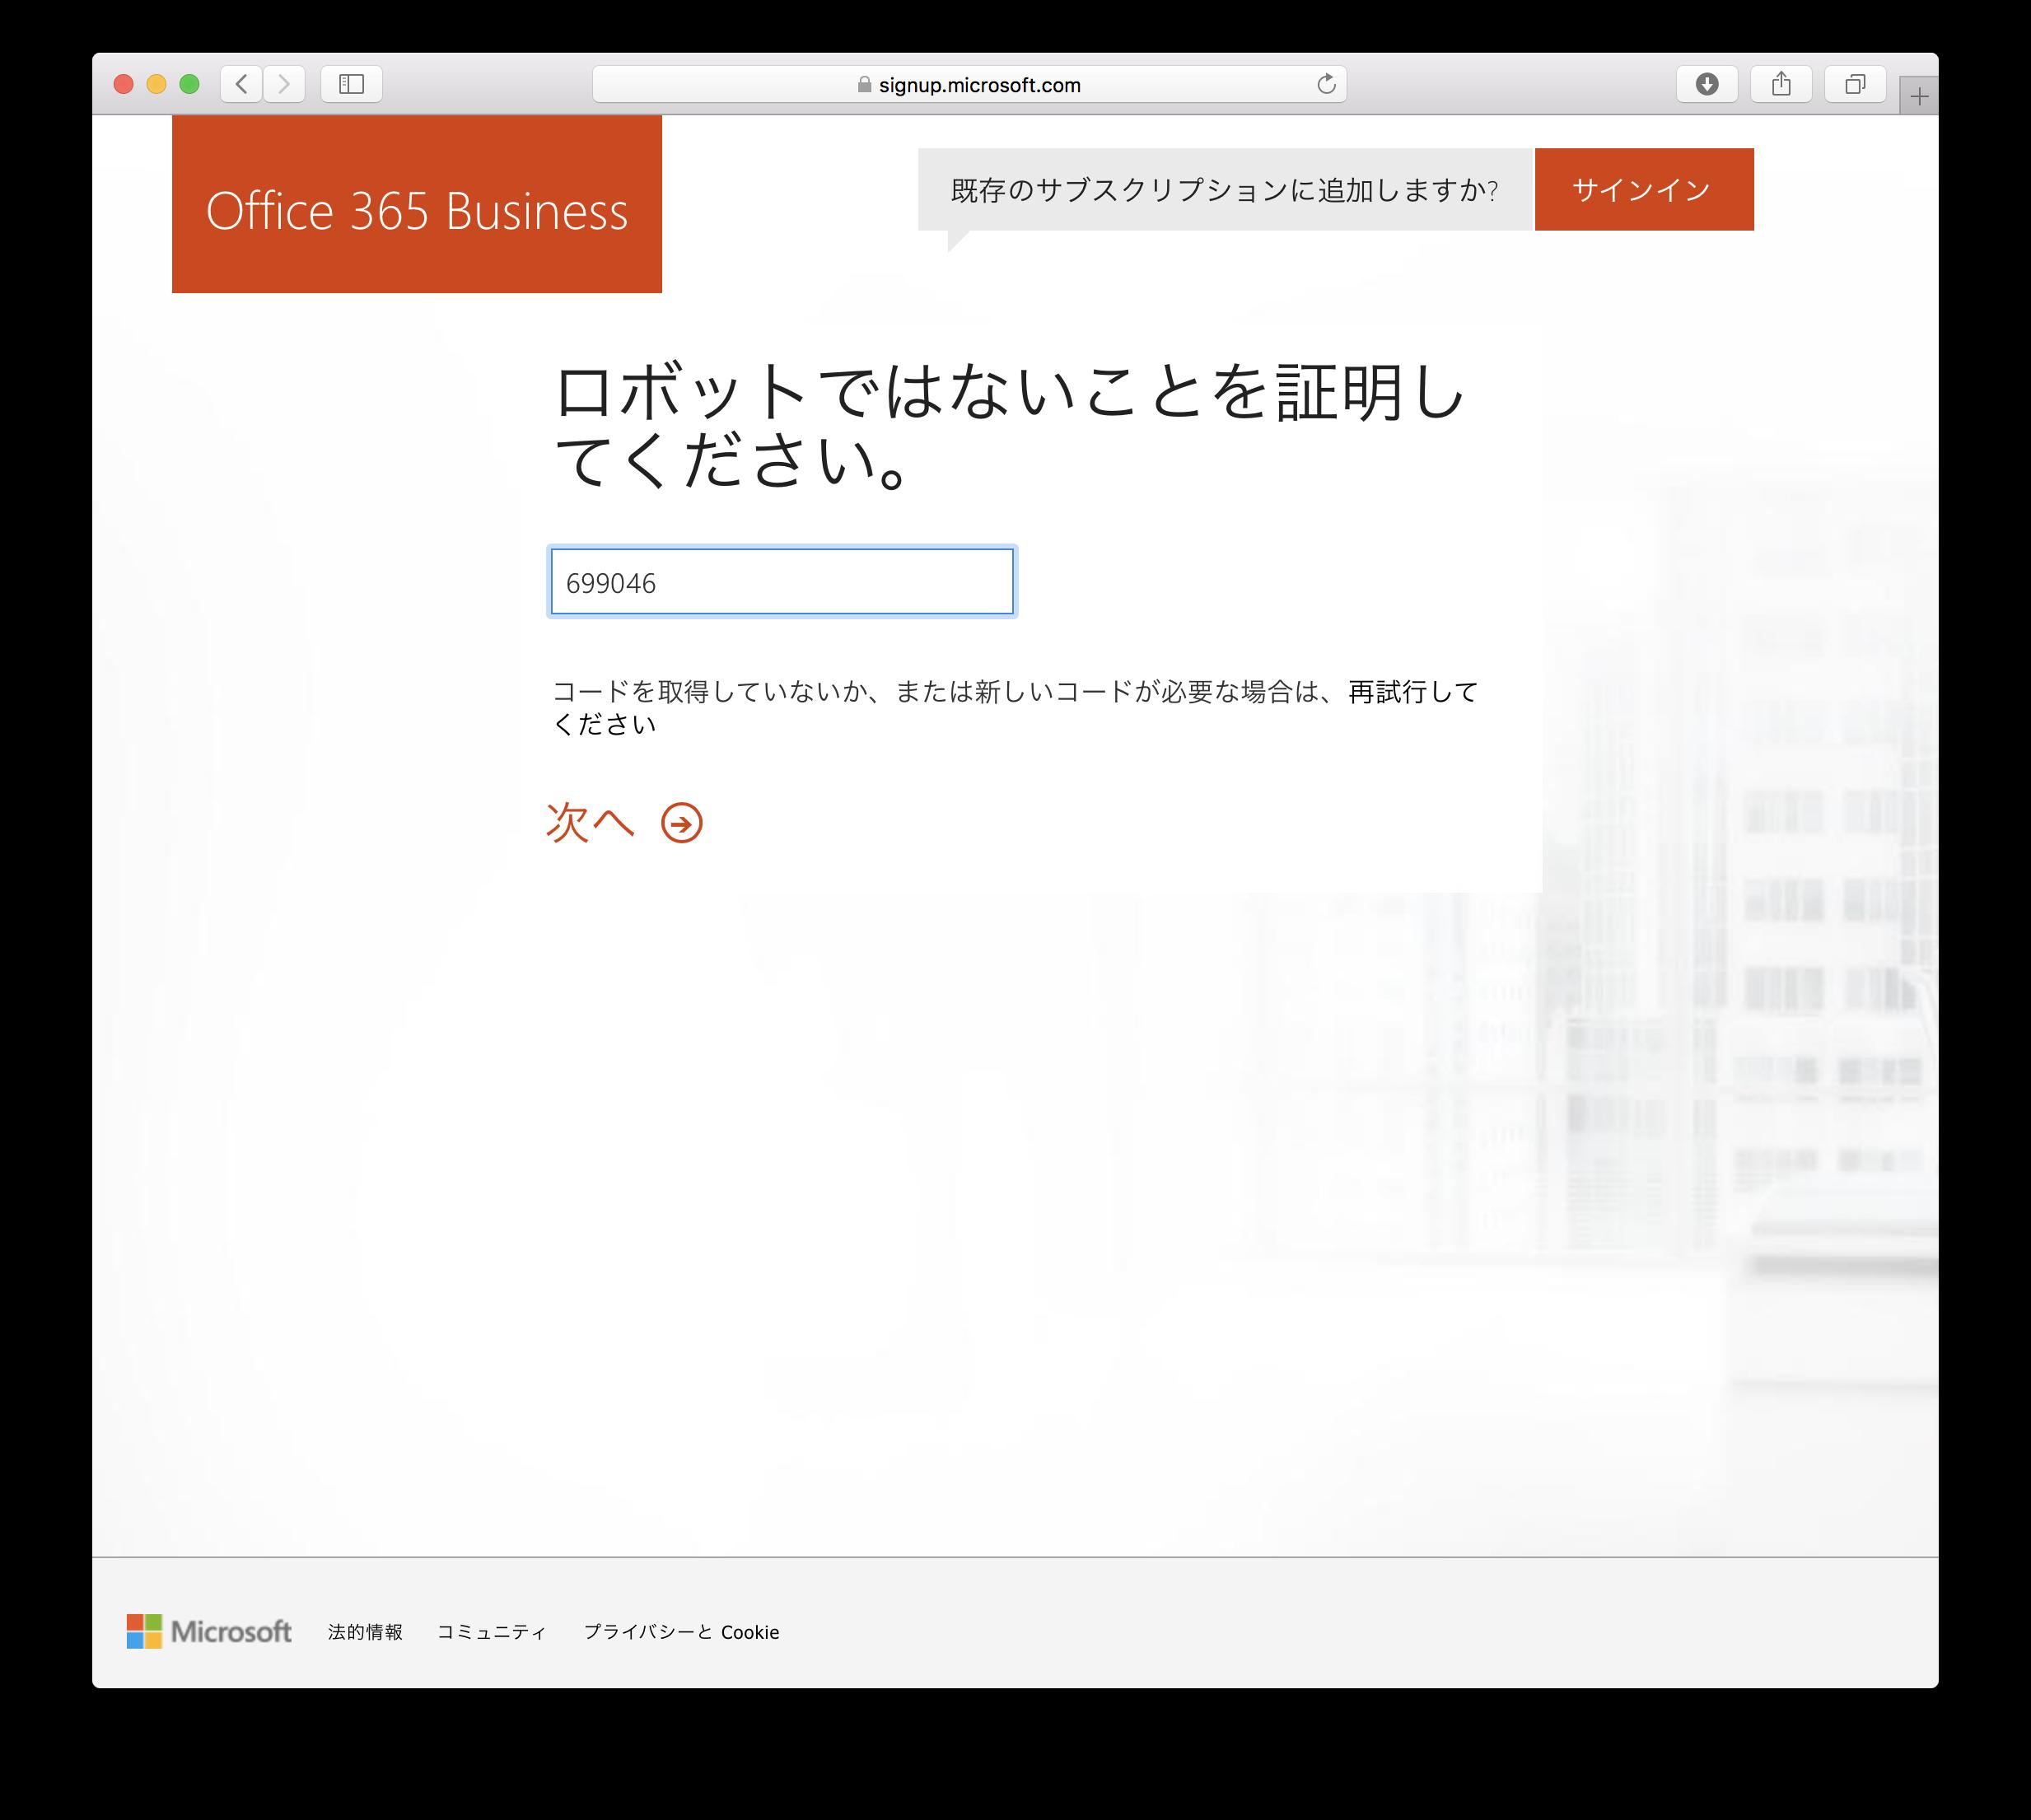 http://www.kozure-hitsuji.com/items/aebde00c0348159008ef19dc211edbfafb7a745f.png